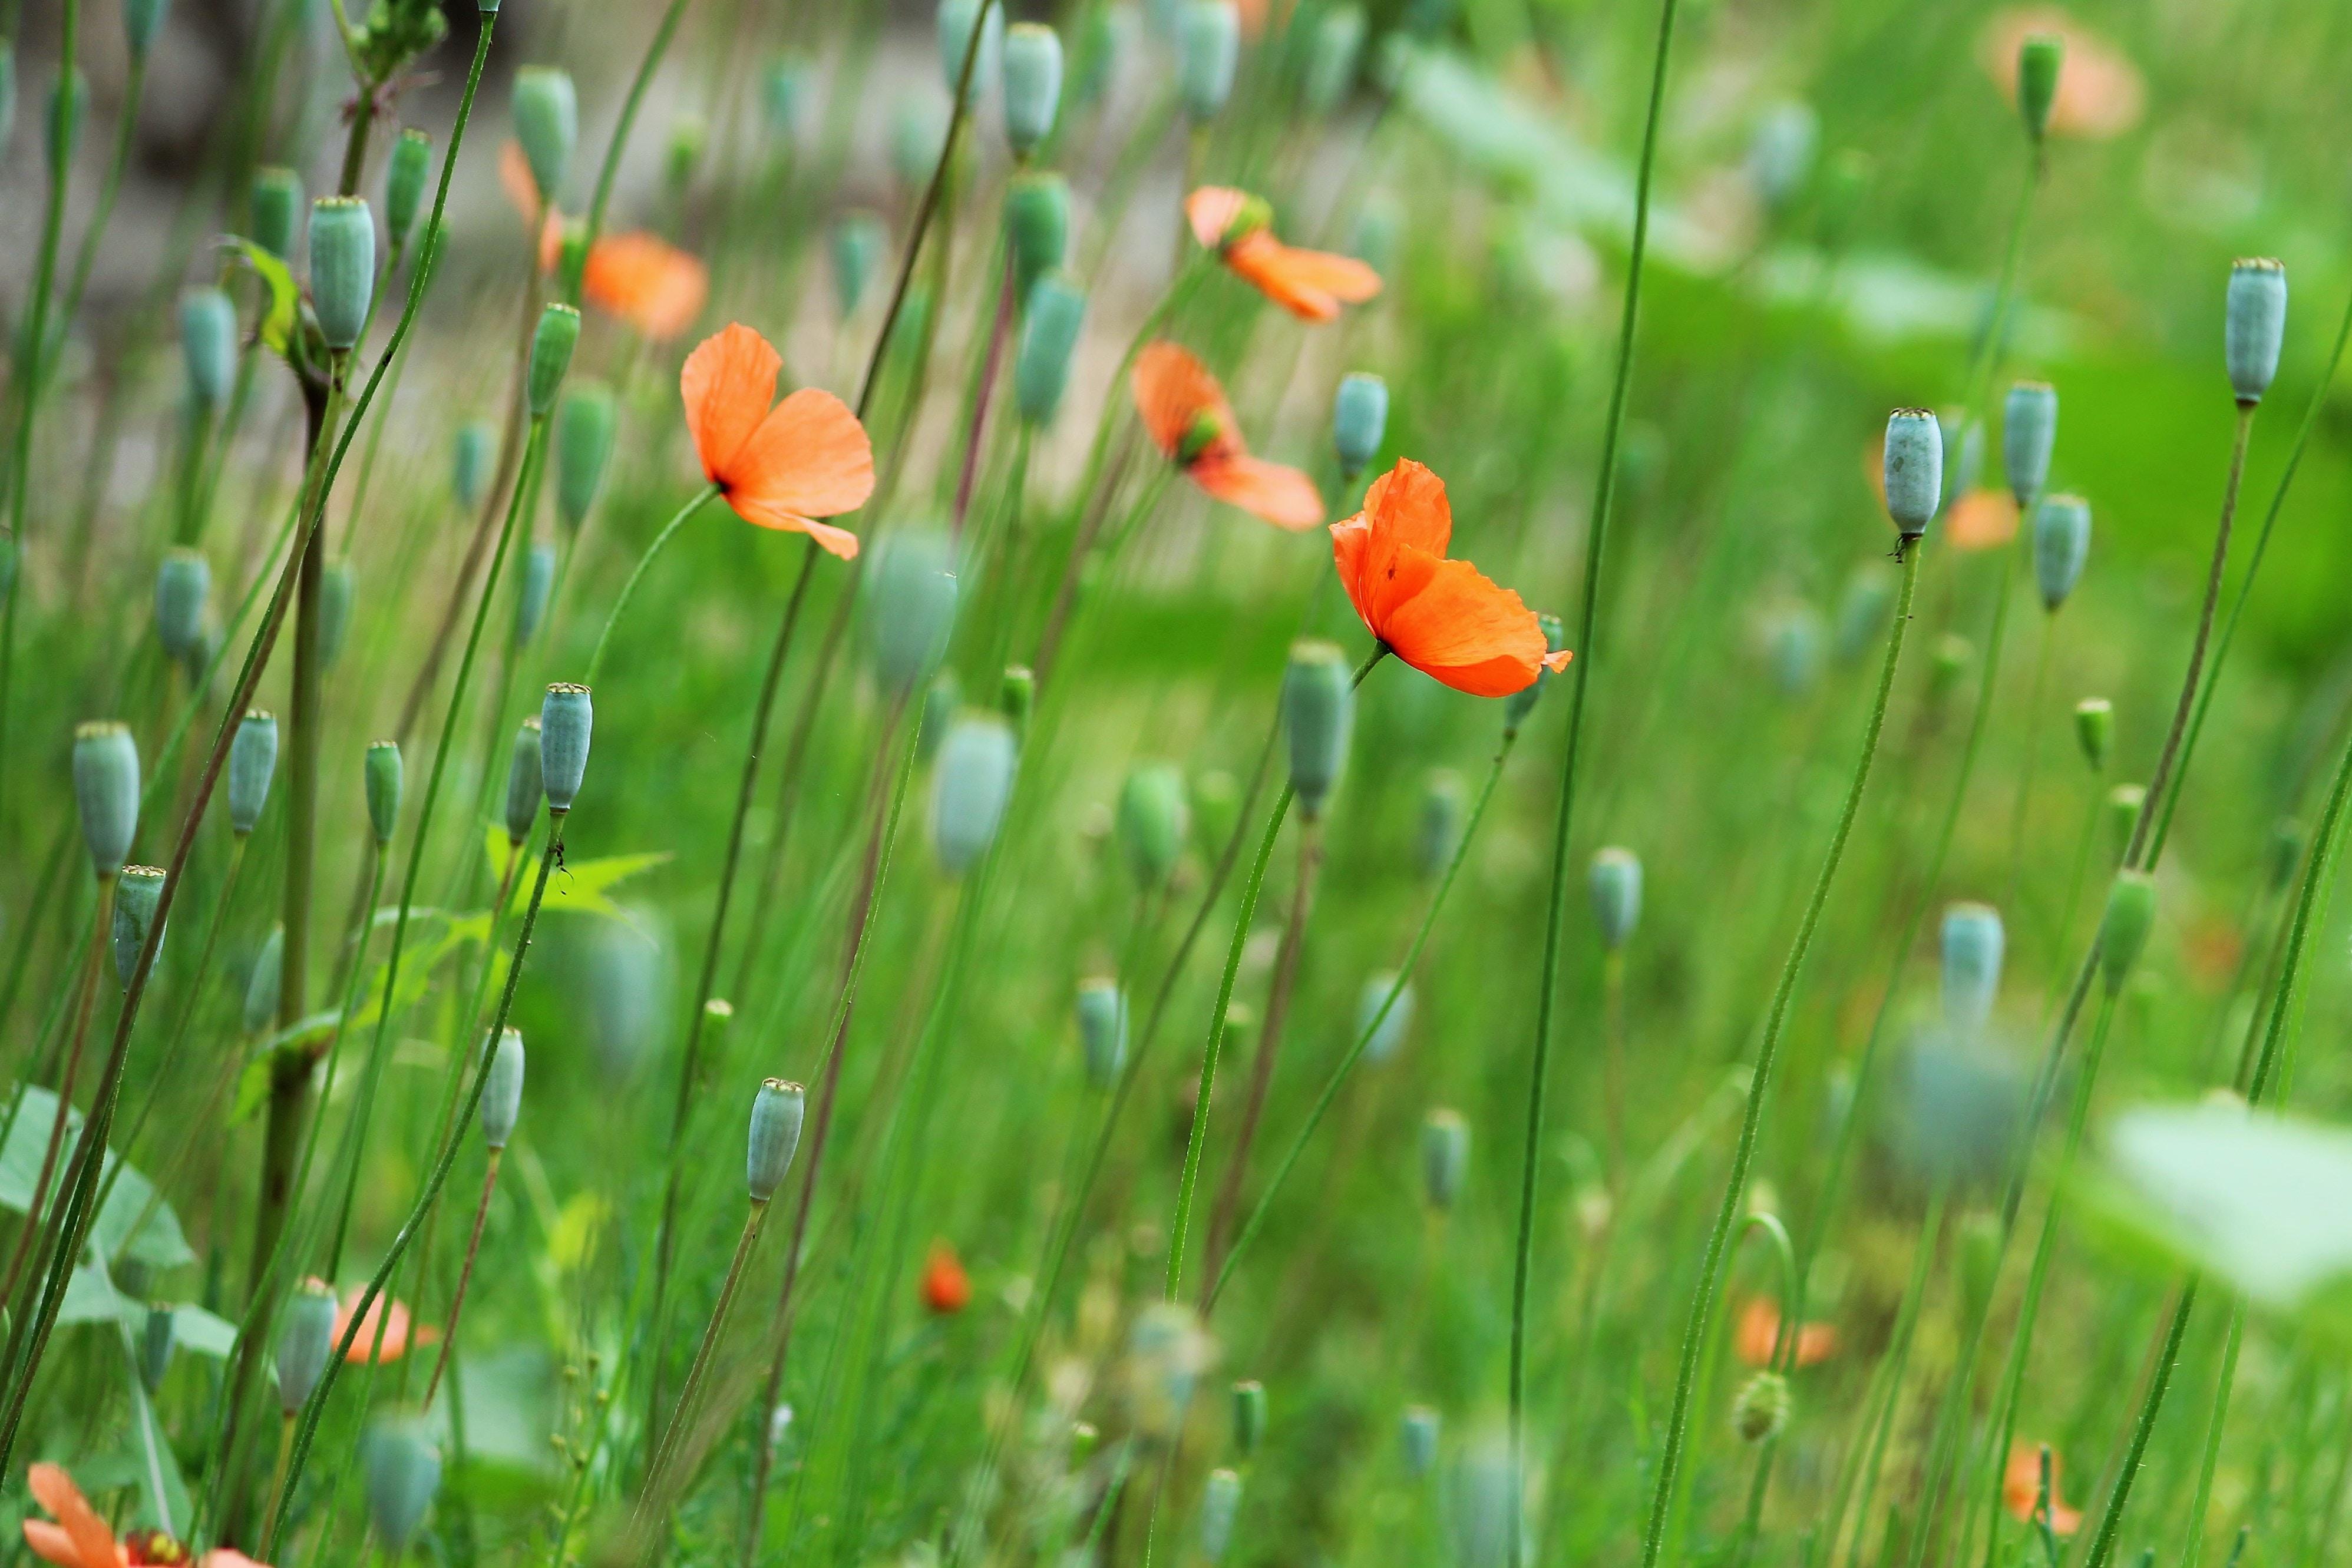 shallow focus photography of orange flowering plant